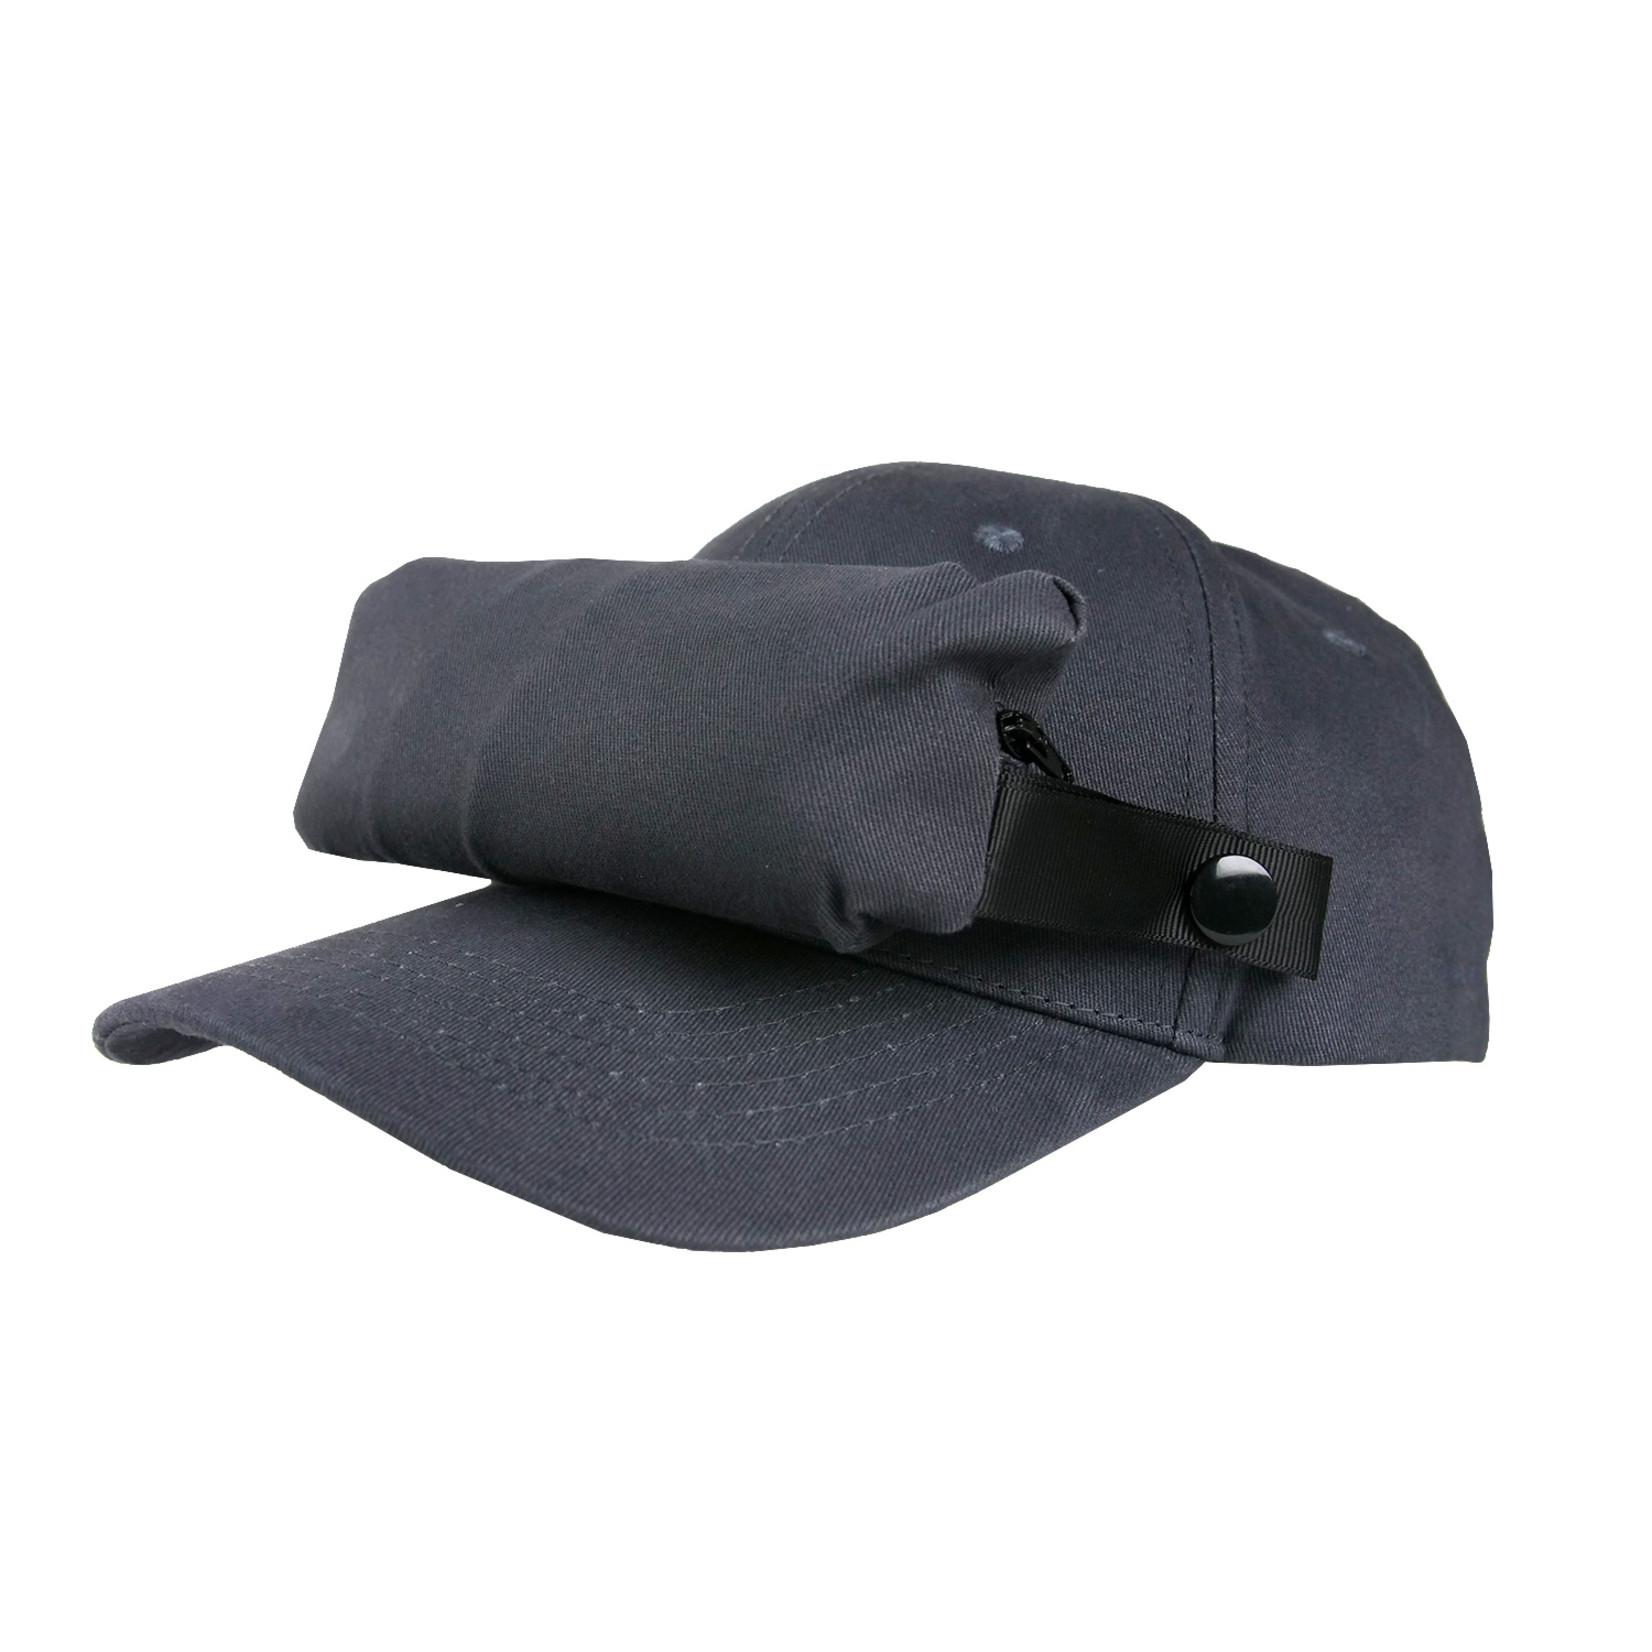 LittleFly BUG CAP - Graphite - Taille unique